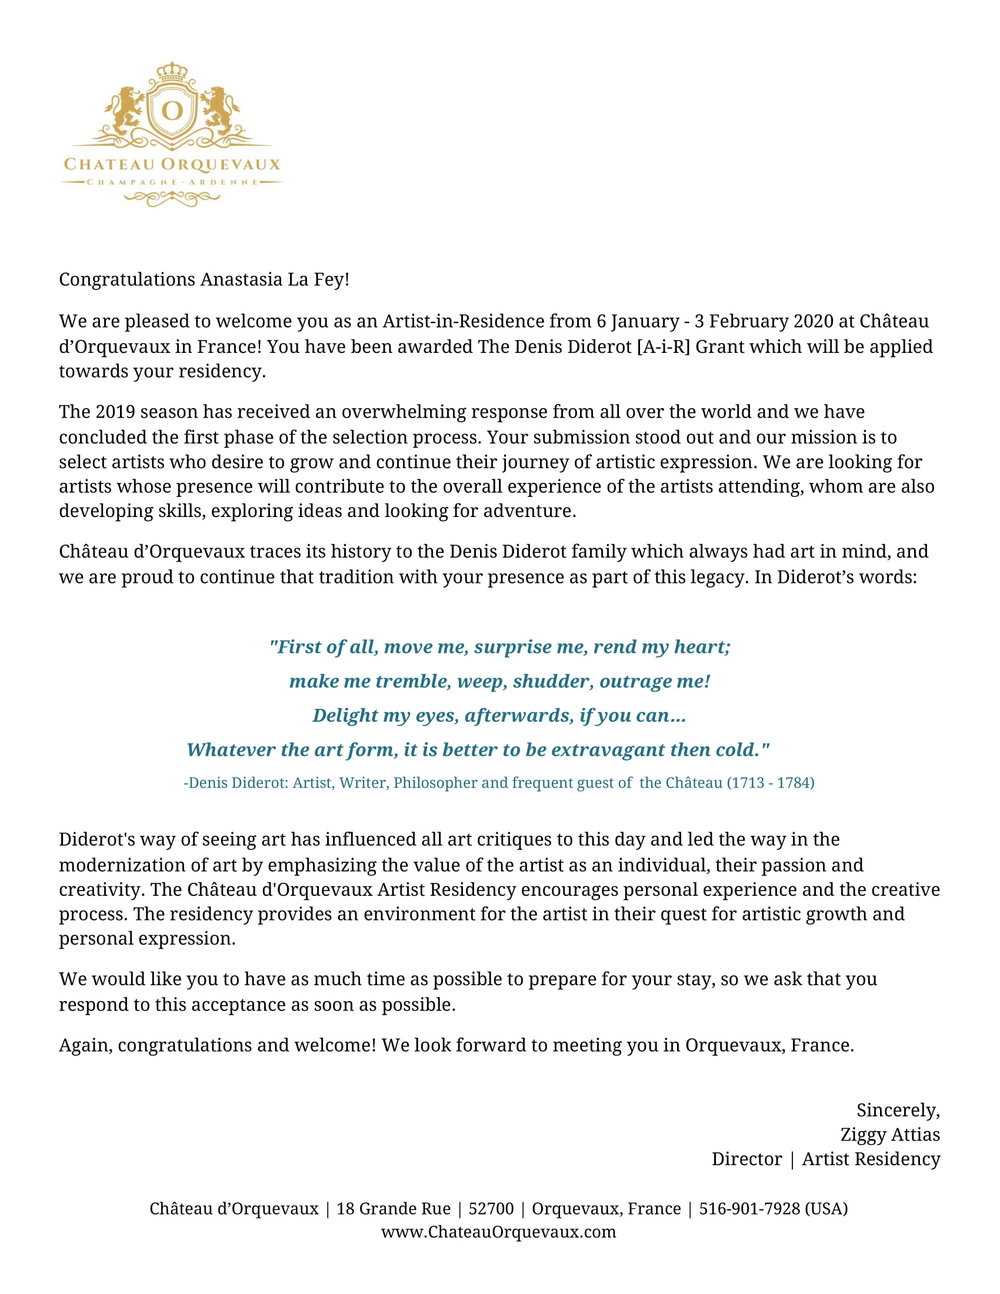 Acceptance Letter Anastasia La Fey-1.jpg